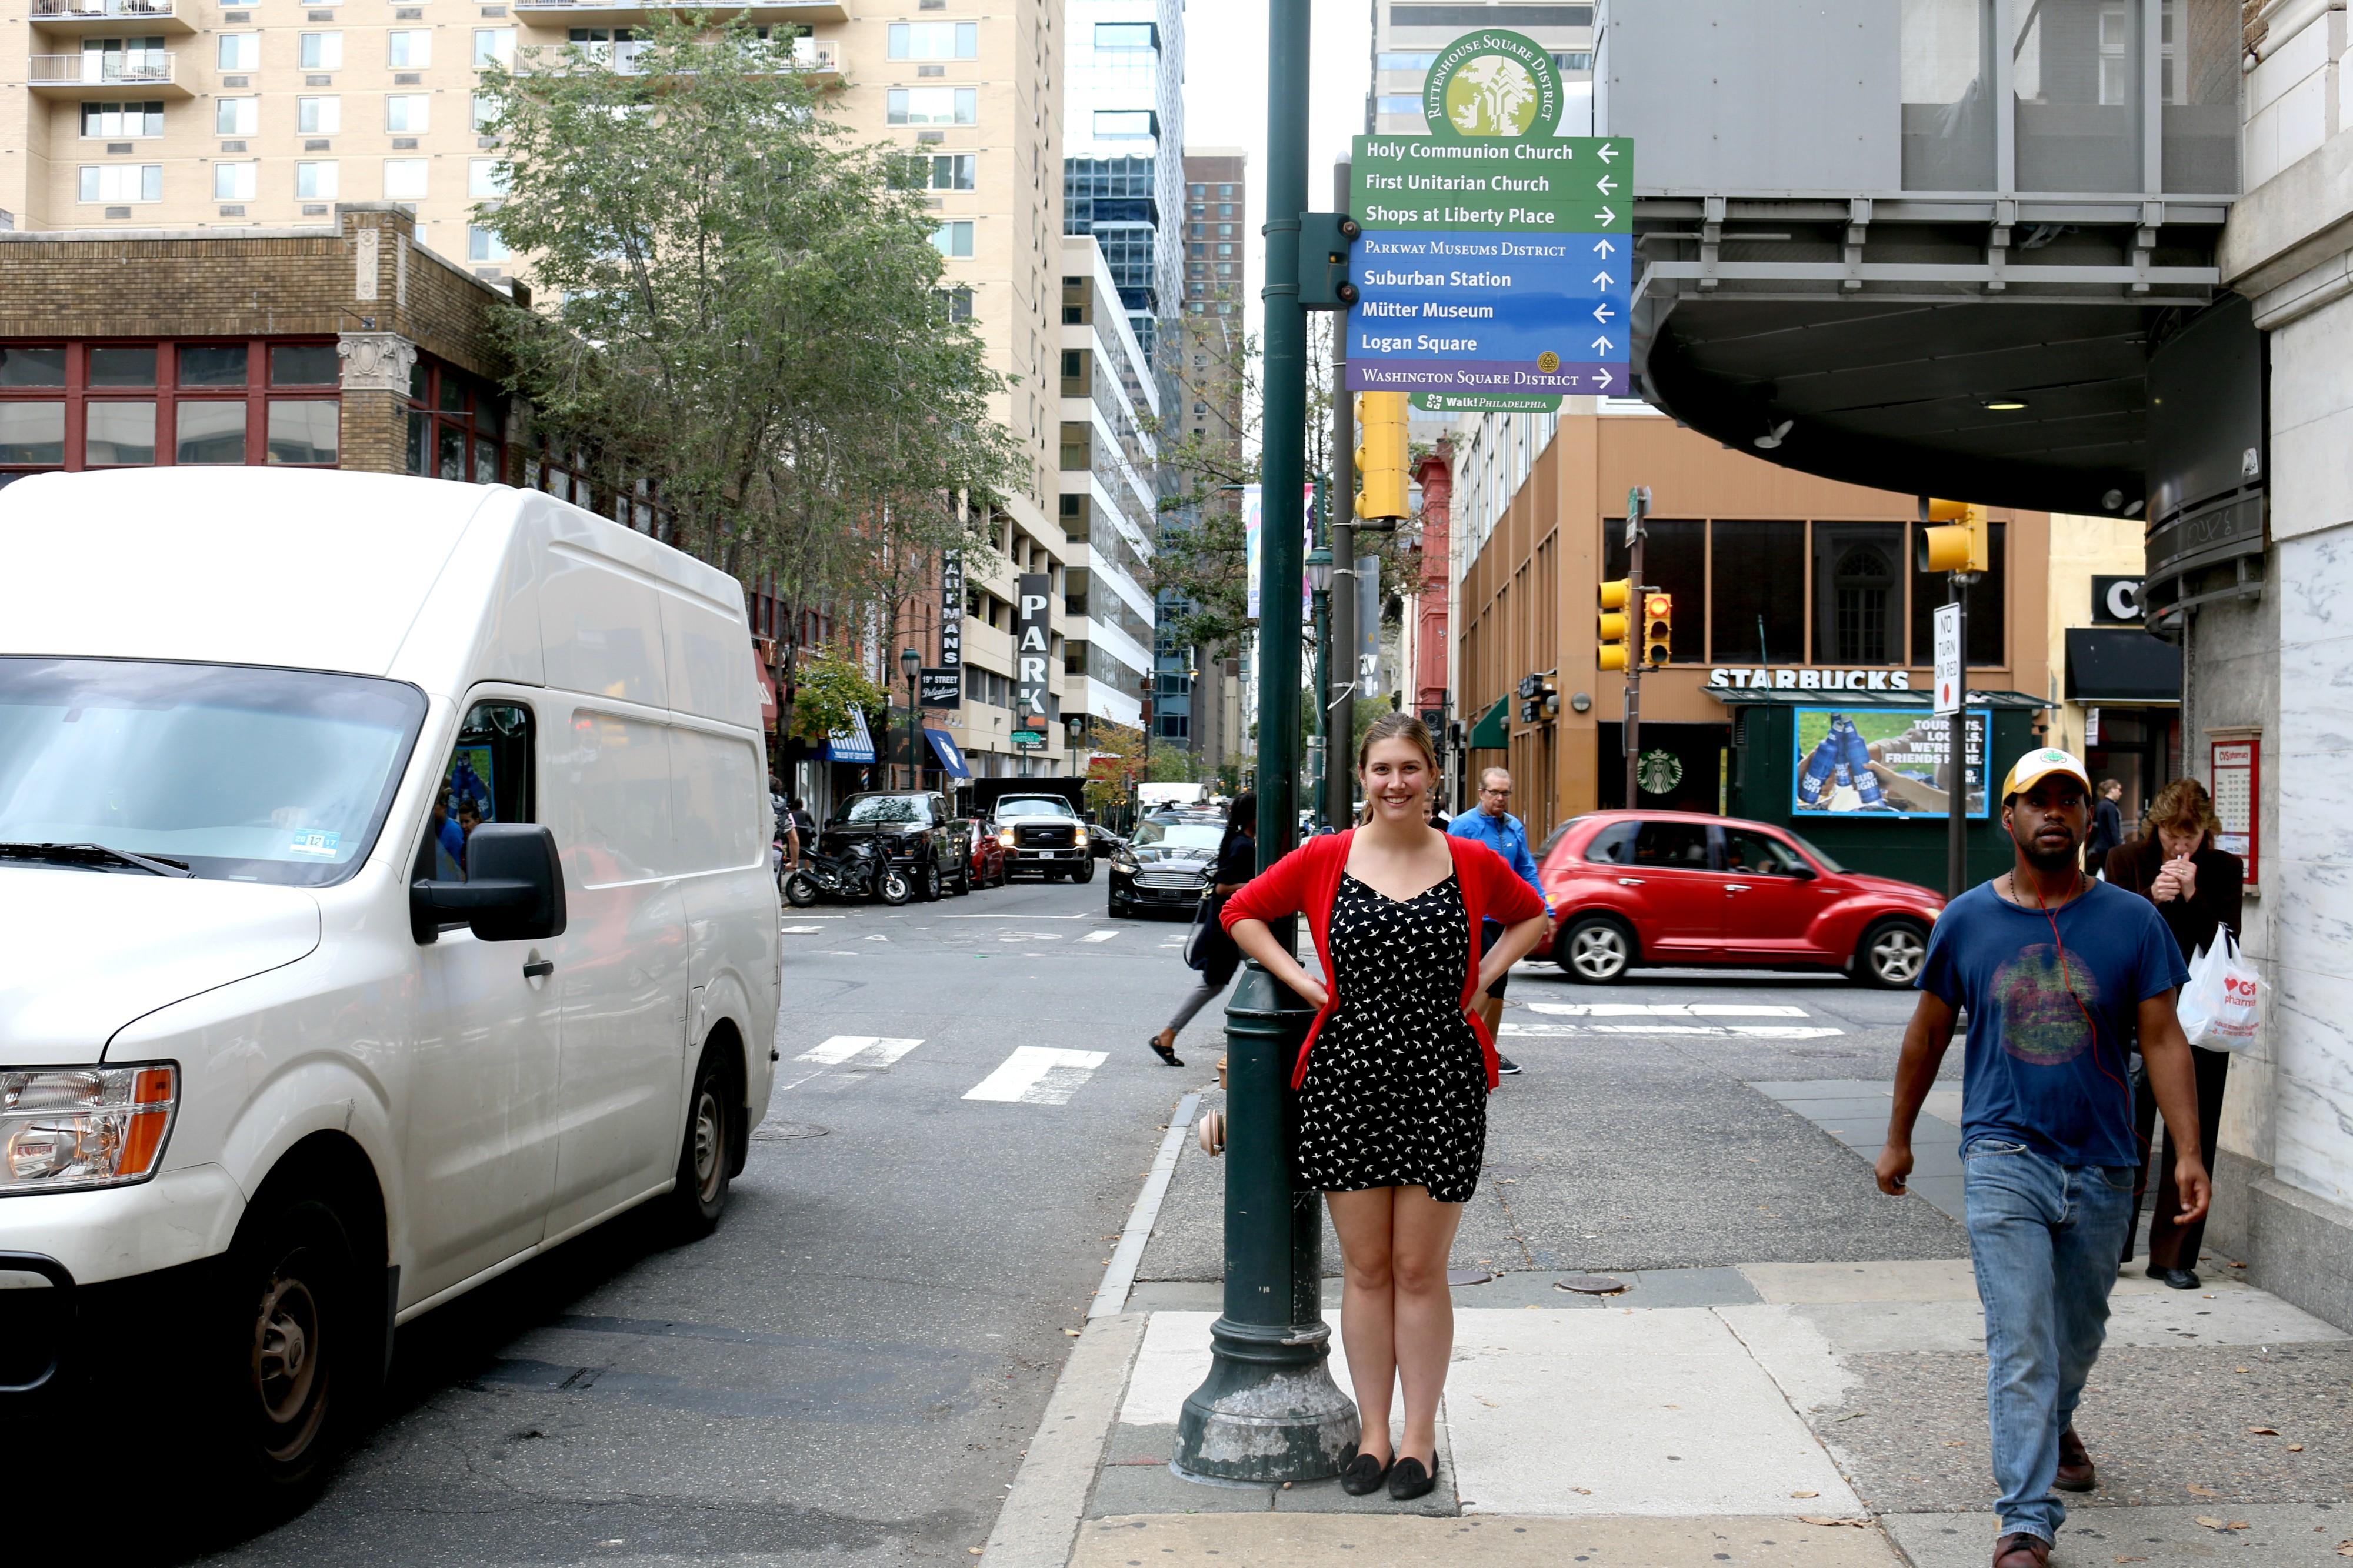 Pedestrian of Philly Chloe FiniganfeetfirstphillyPedestrian_of_Philly_Chloe_Finigan